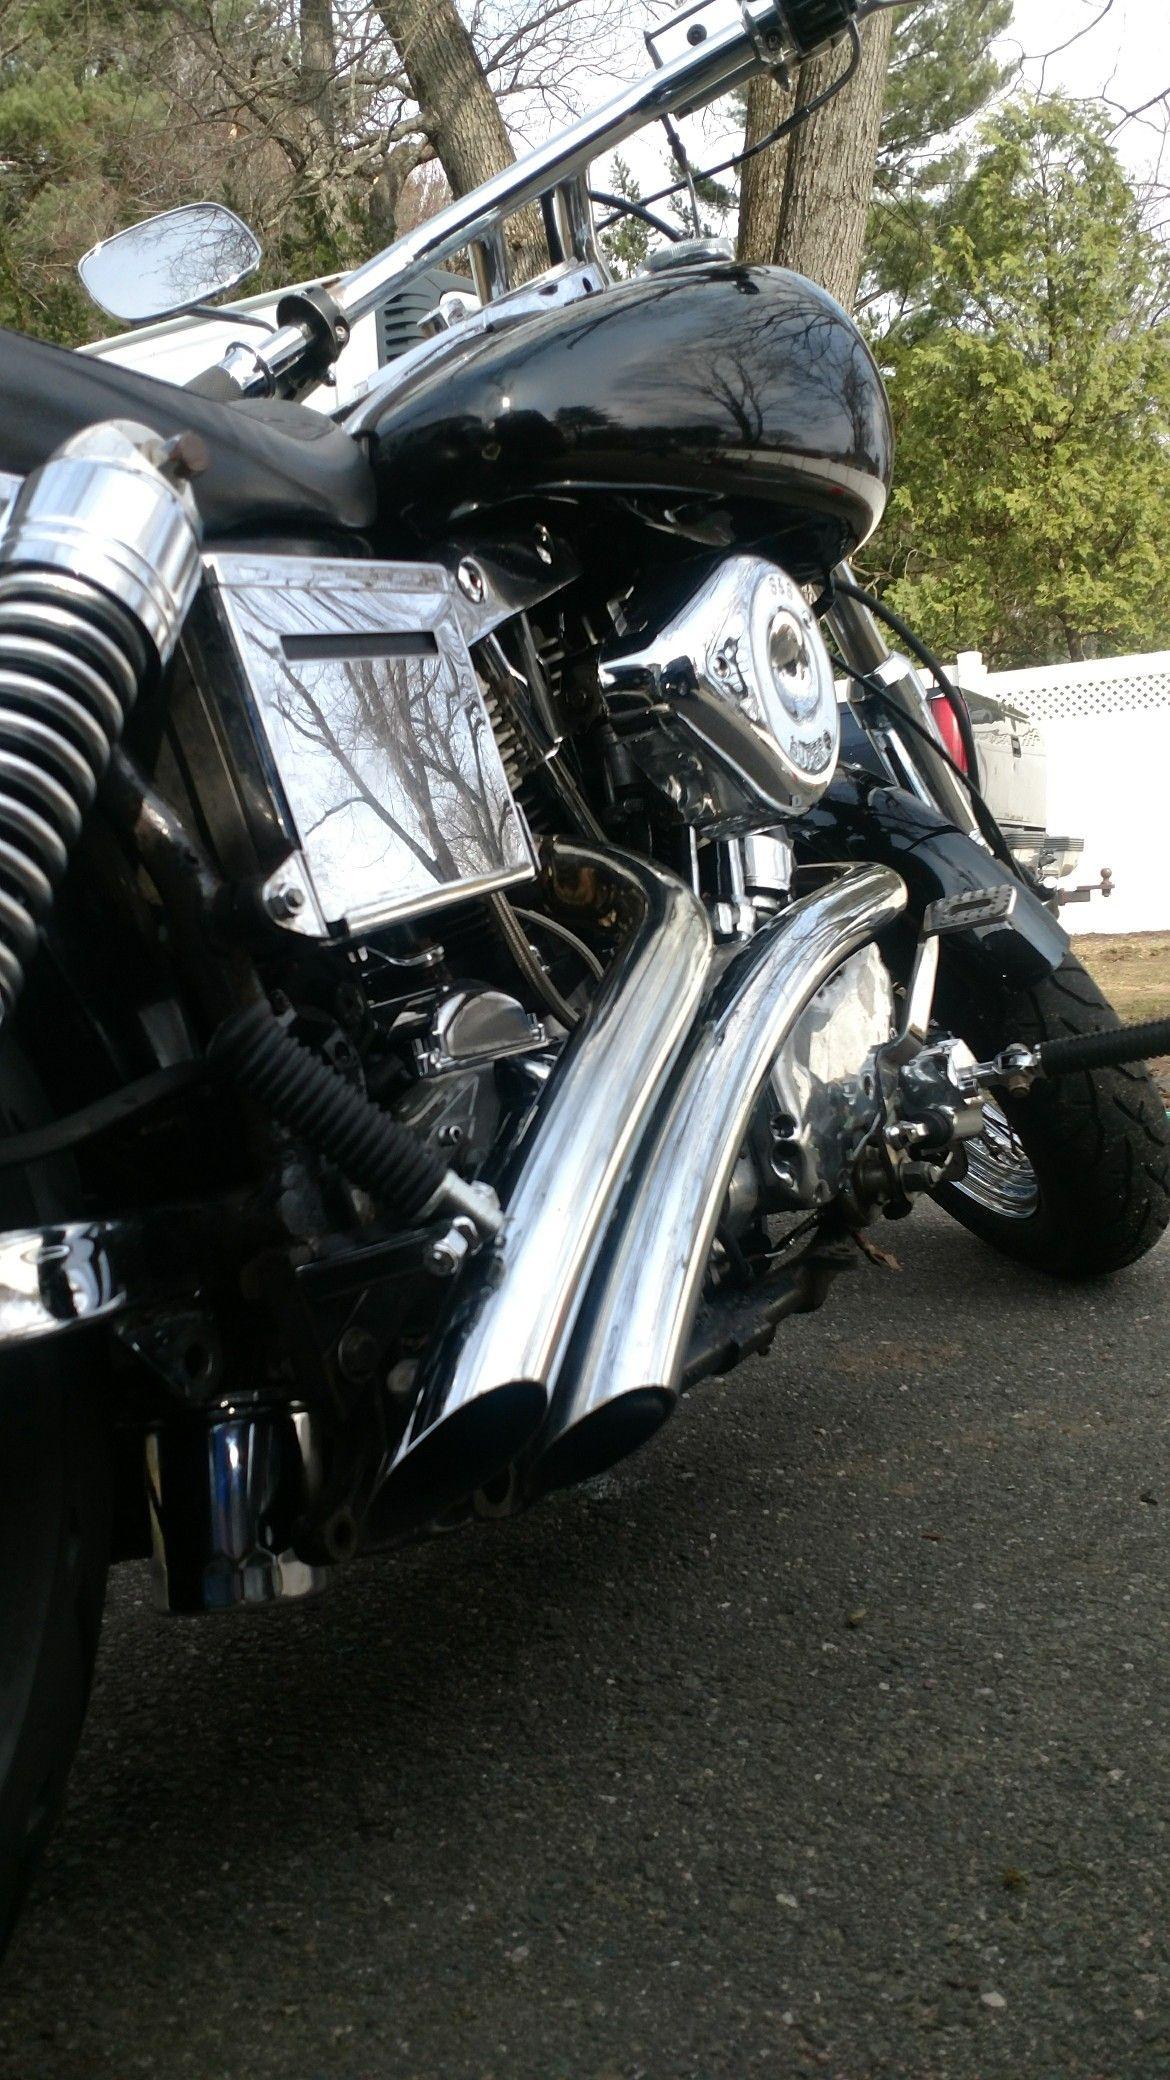 68 FLH in 2020 Motorcycle, Vehicles